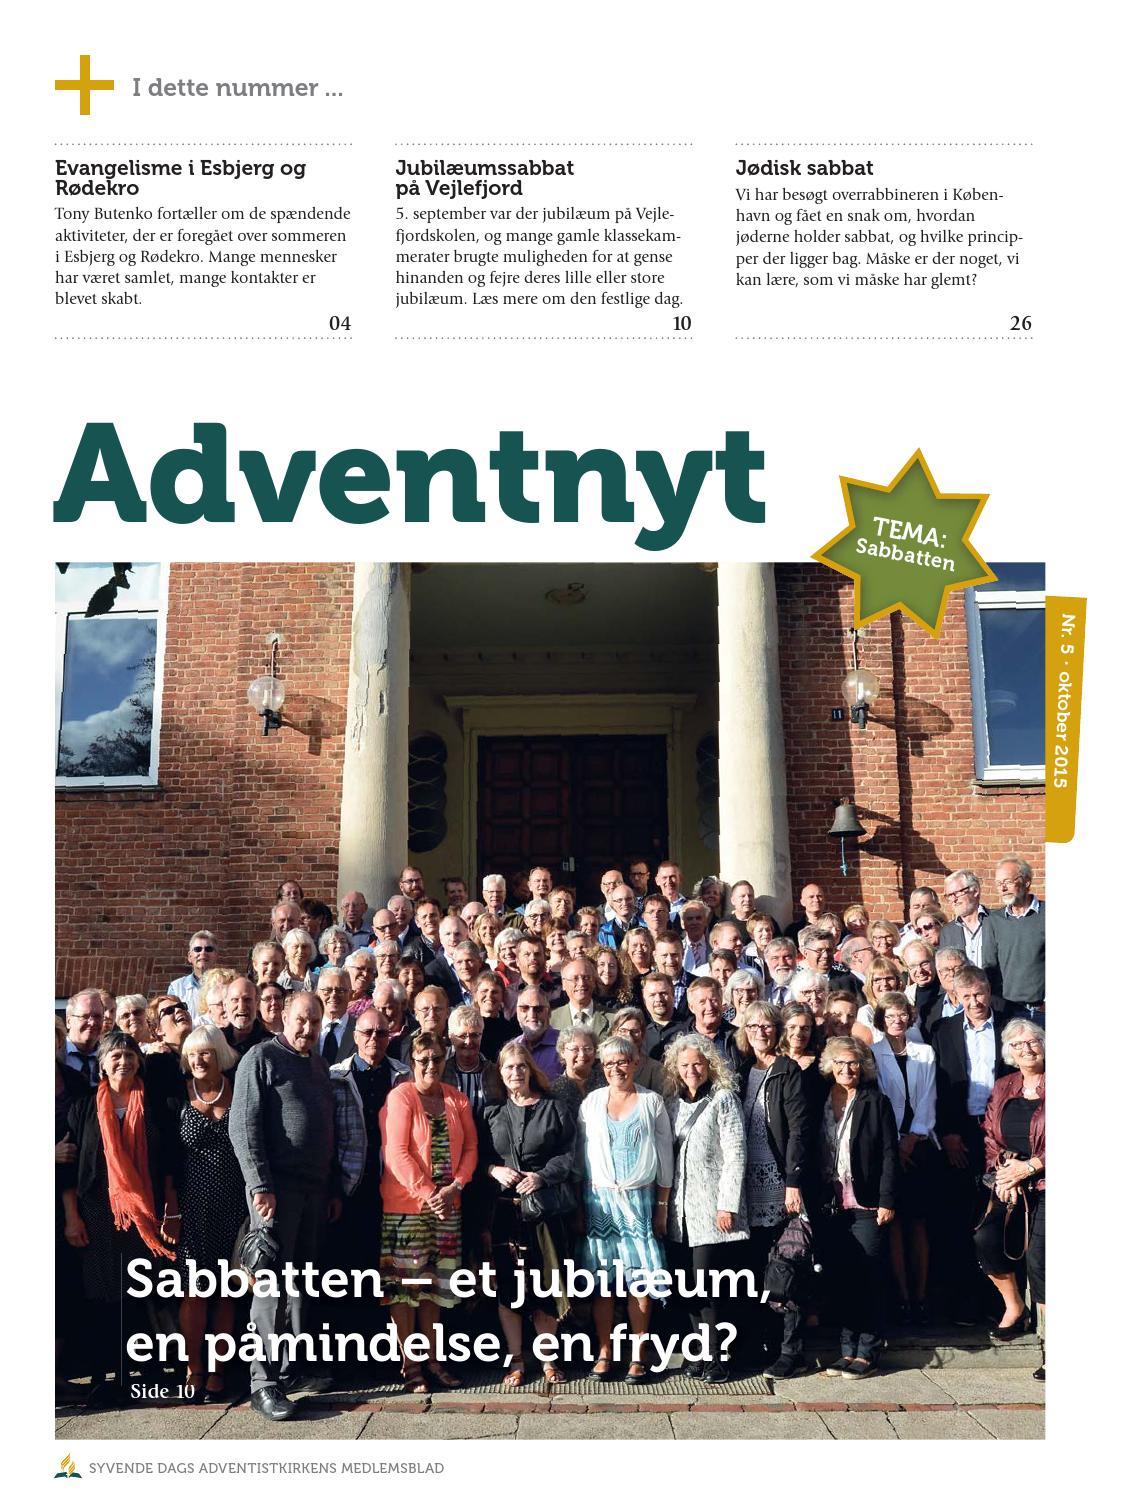 5287b455fc51 2015-5 Adventnyt by Adventistkirken - issuu